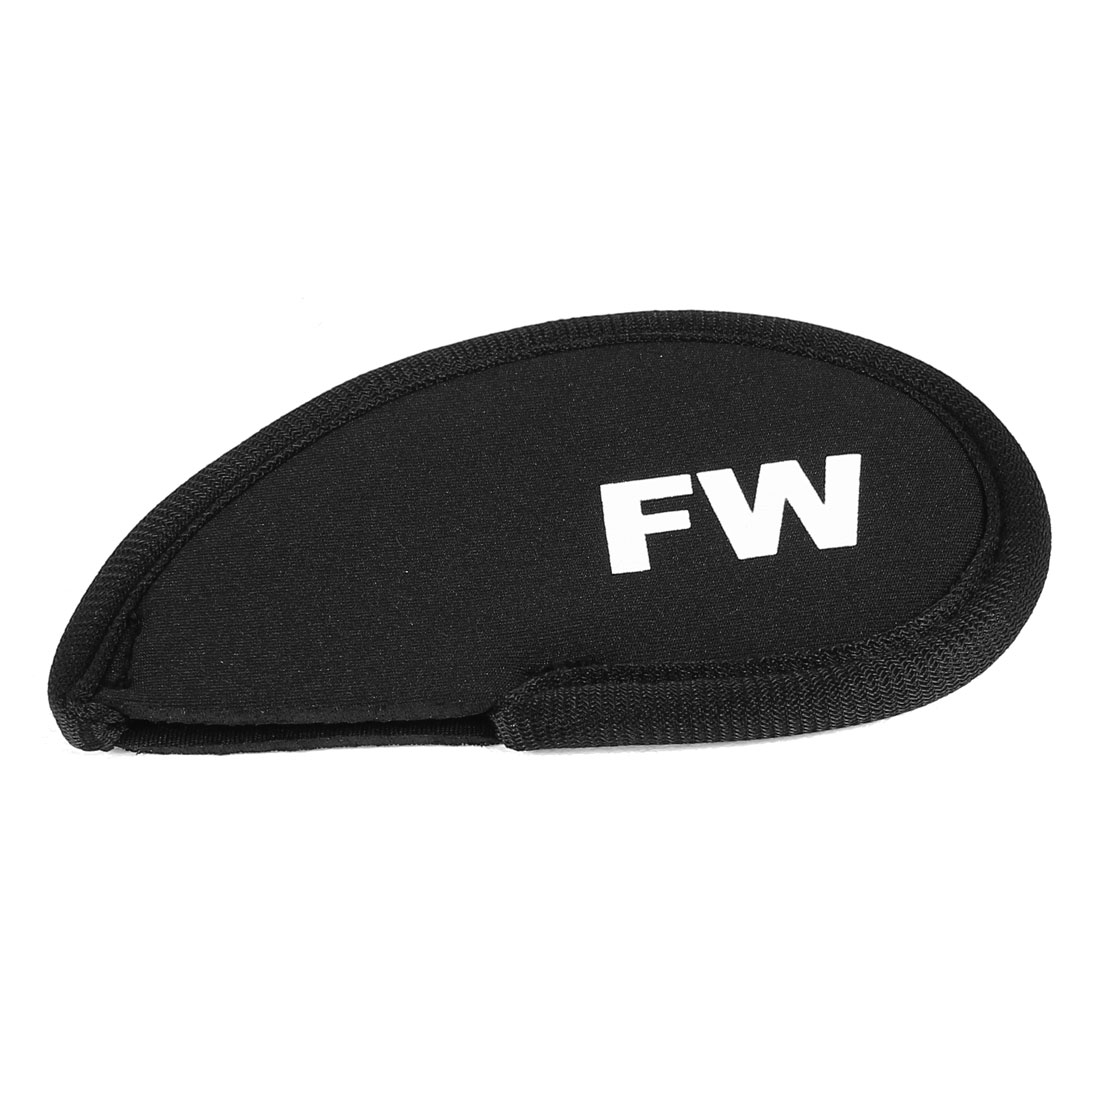 Black Neoprene Golf Club Head Cover FW Wedge Iron Protective Headcovers